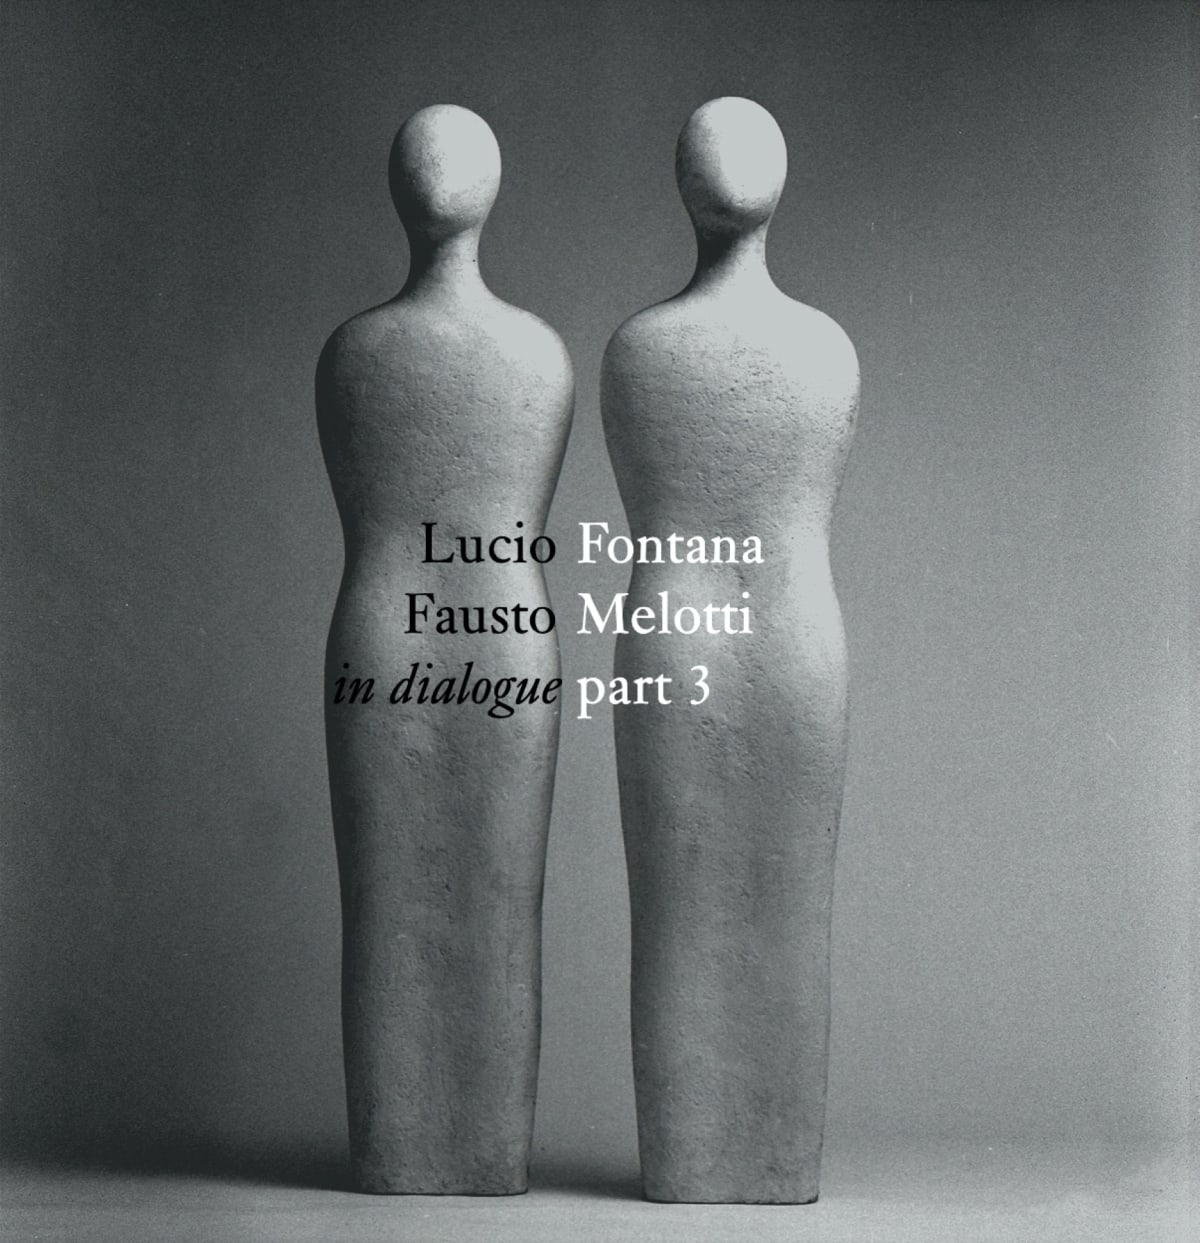 Focus on Art: Lucio Fontana and Fausto Melotti | In dialogue | Part 3